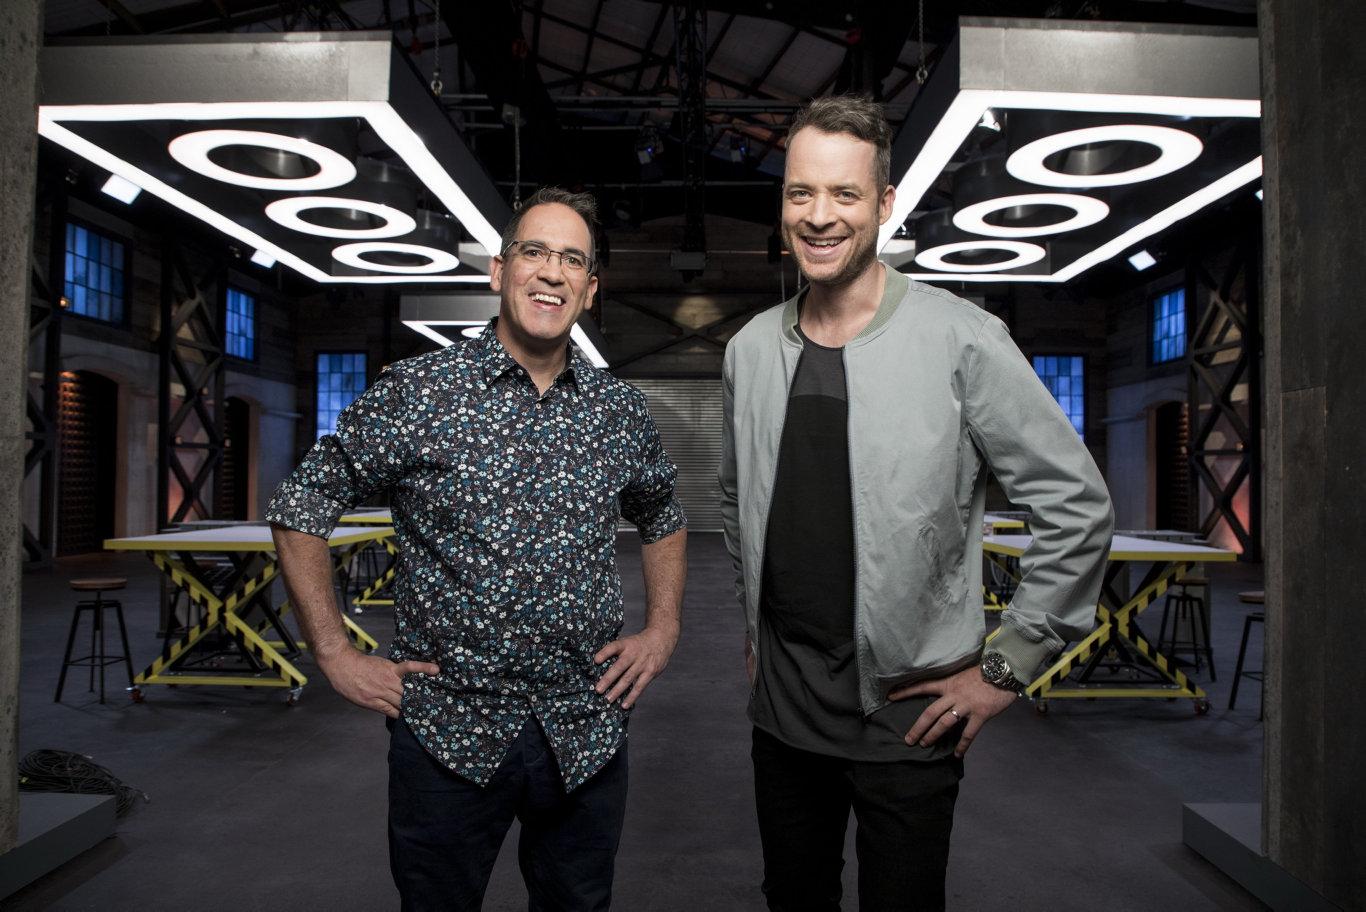 Matt and Lyn will need to impress judge Ryan 'Brickman' McNaught, pictured left with host Hamish Blake.